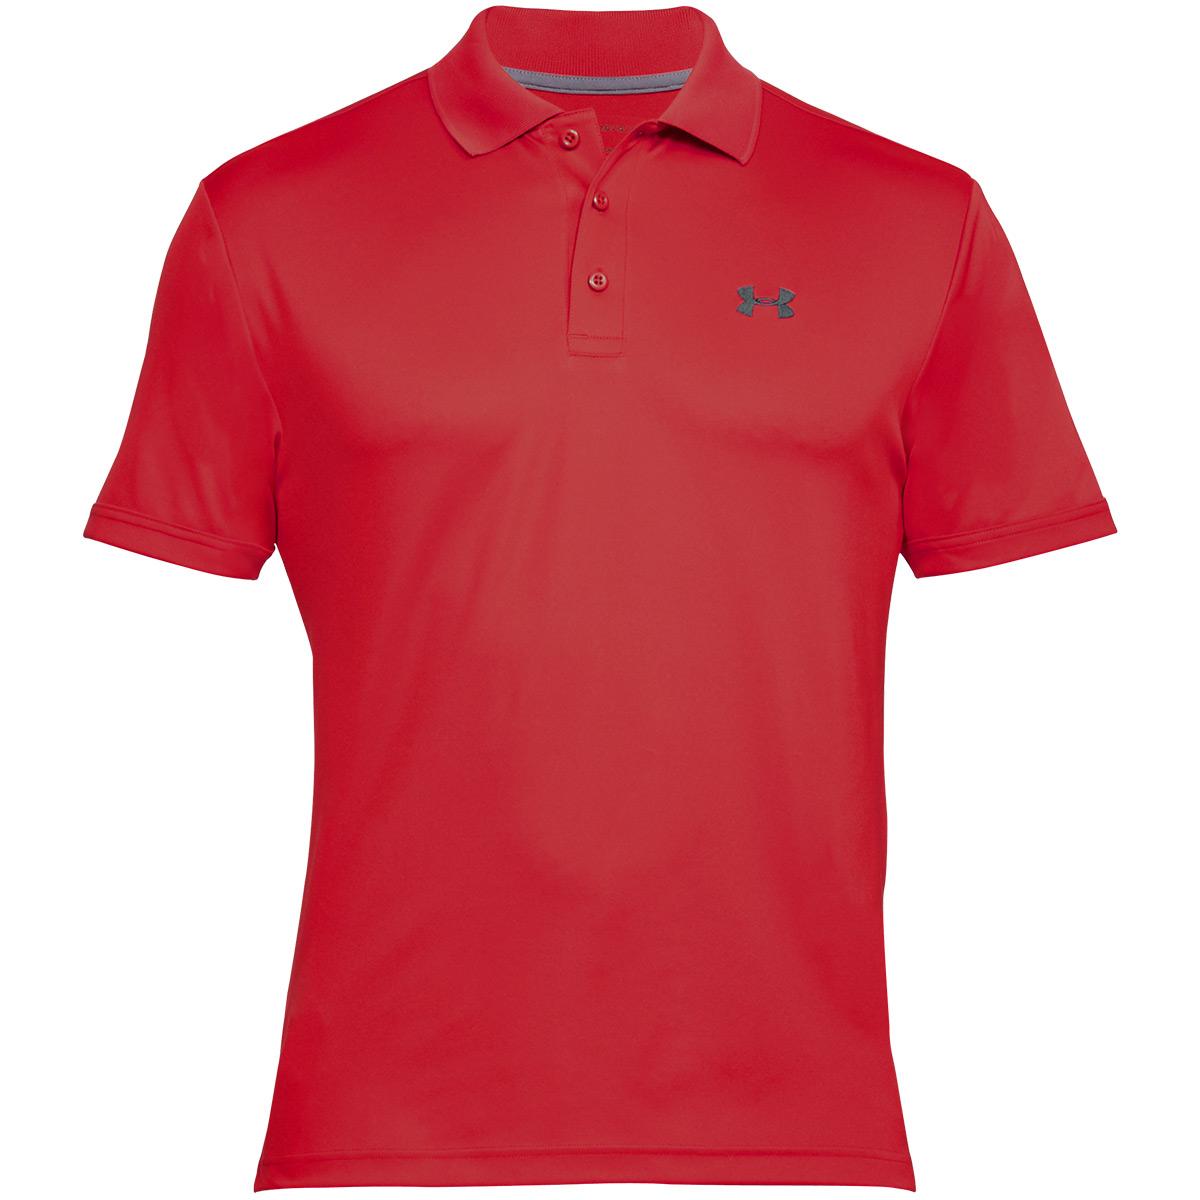 Under-Armour-Mens-2019-UA-Performance-Golf-Stretch-Durable-Polo-Shirt thumbnail 49